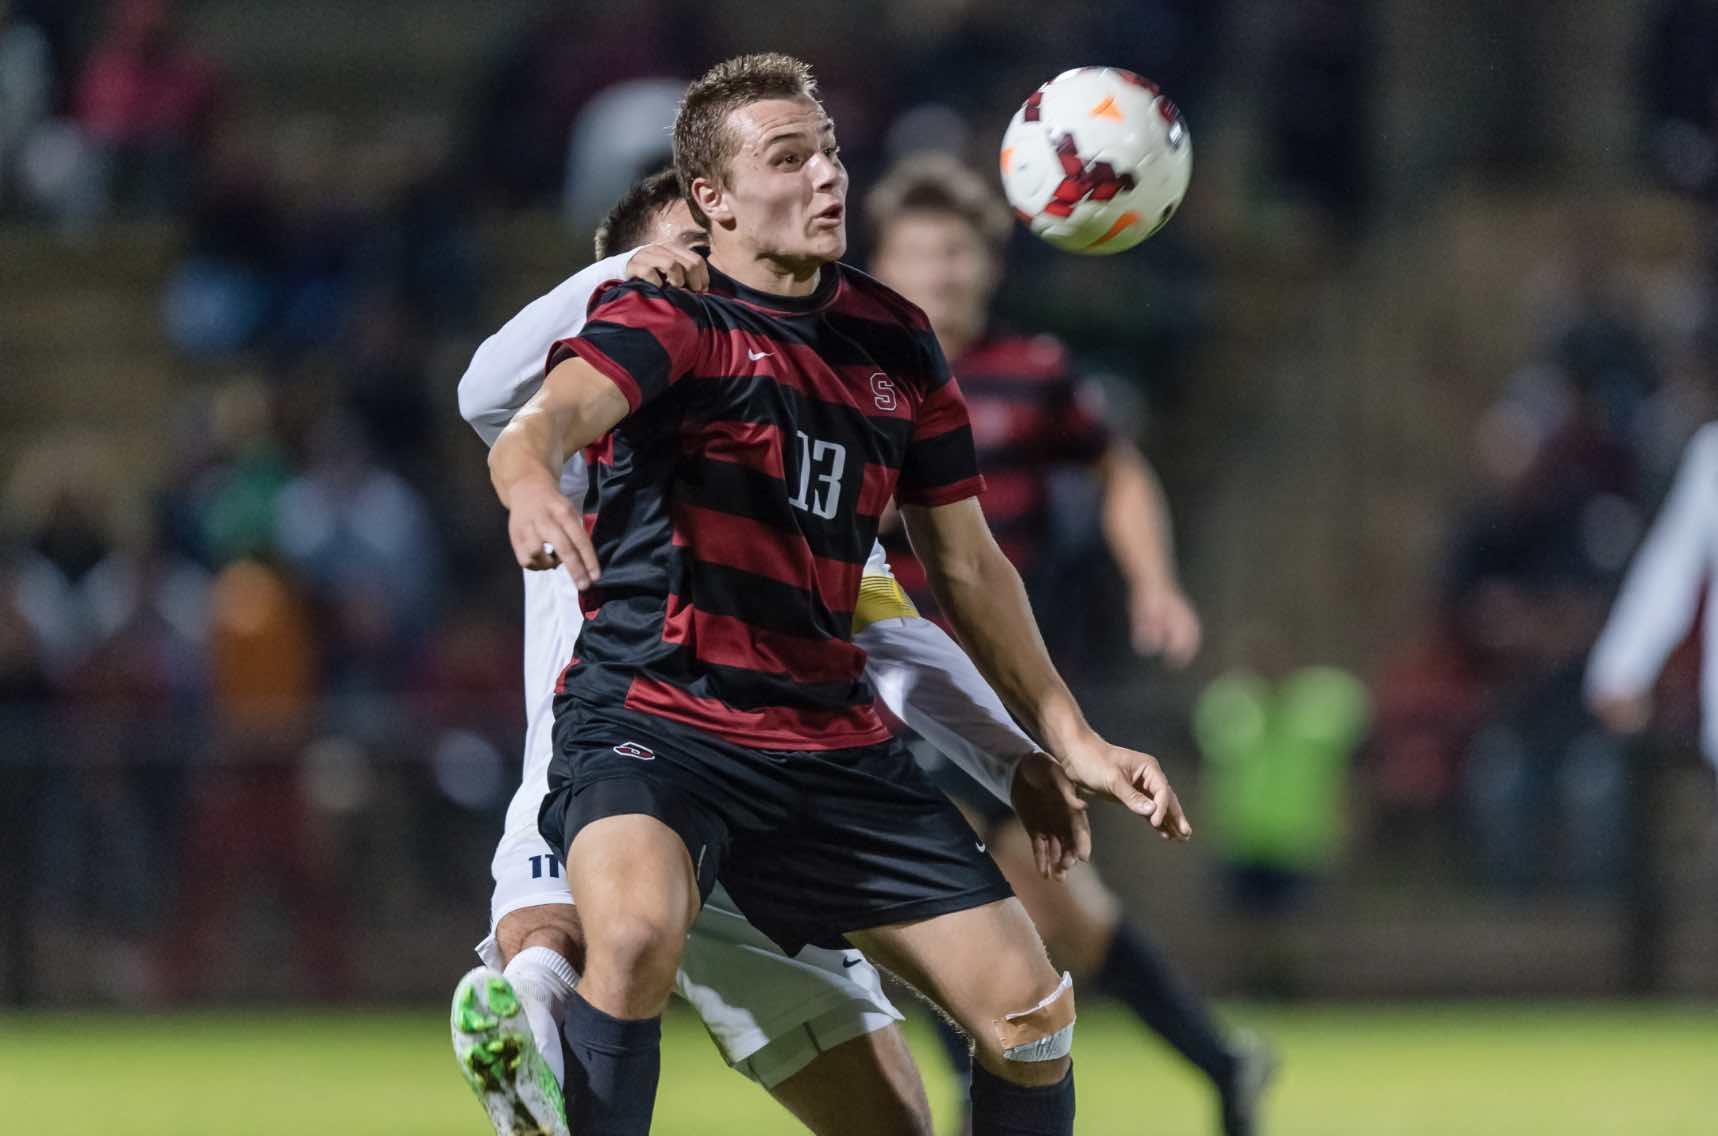 Stanford & USYNT player Jordan Morris undergoes knee surgery